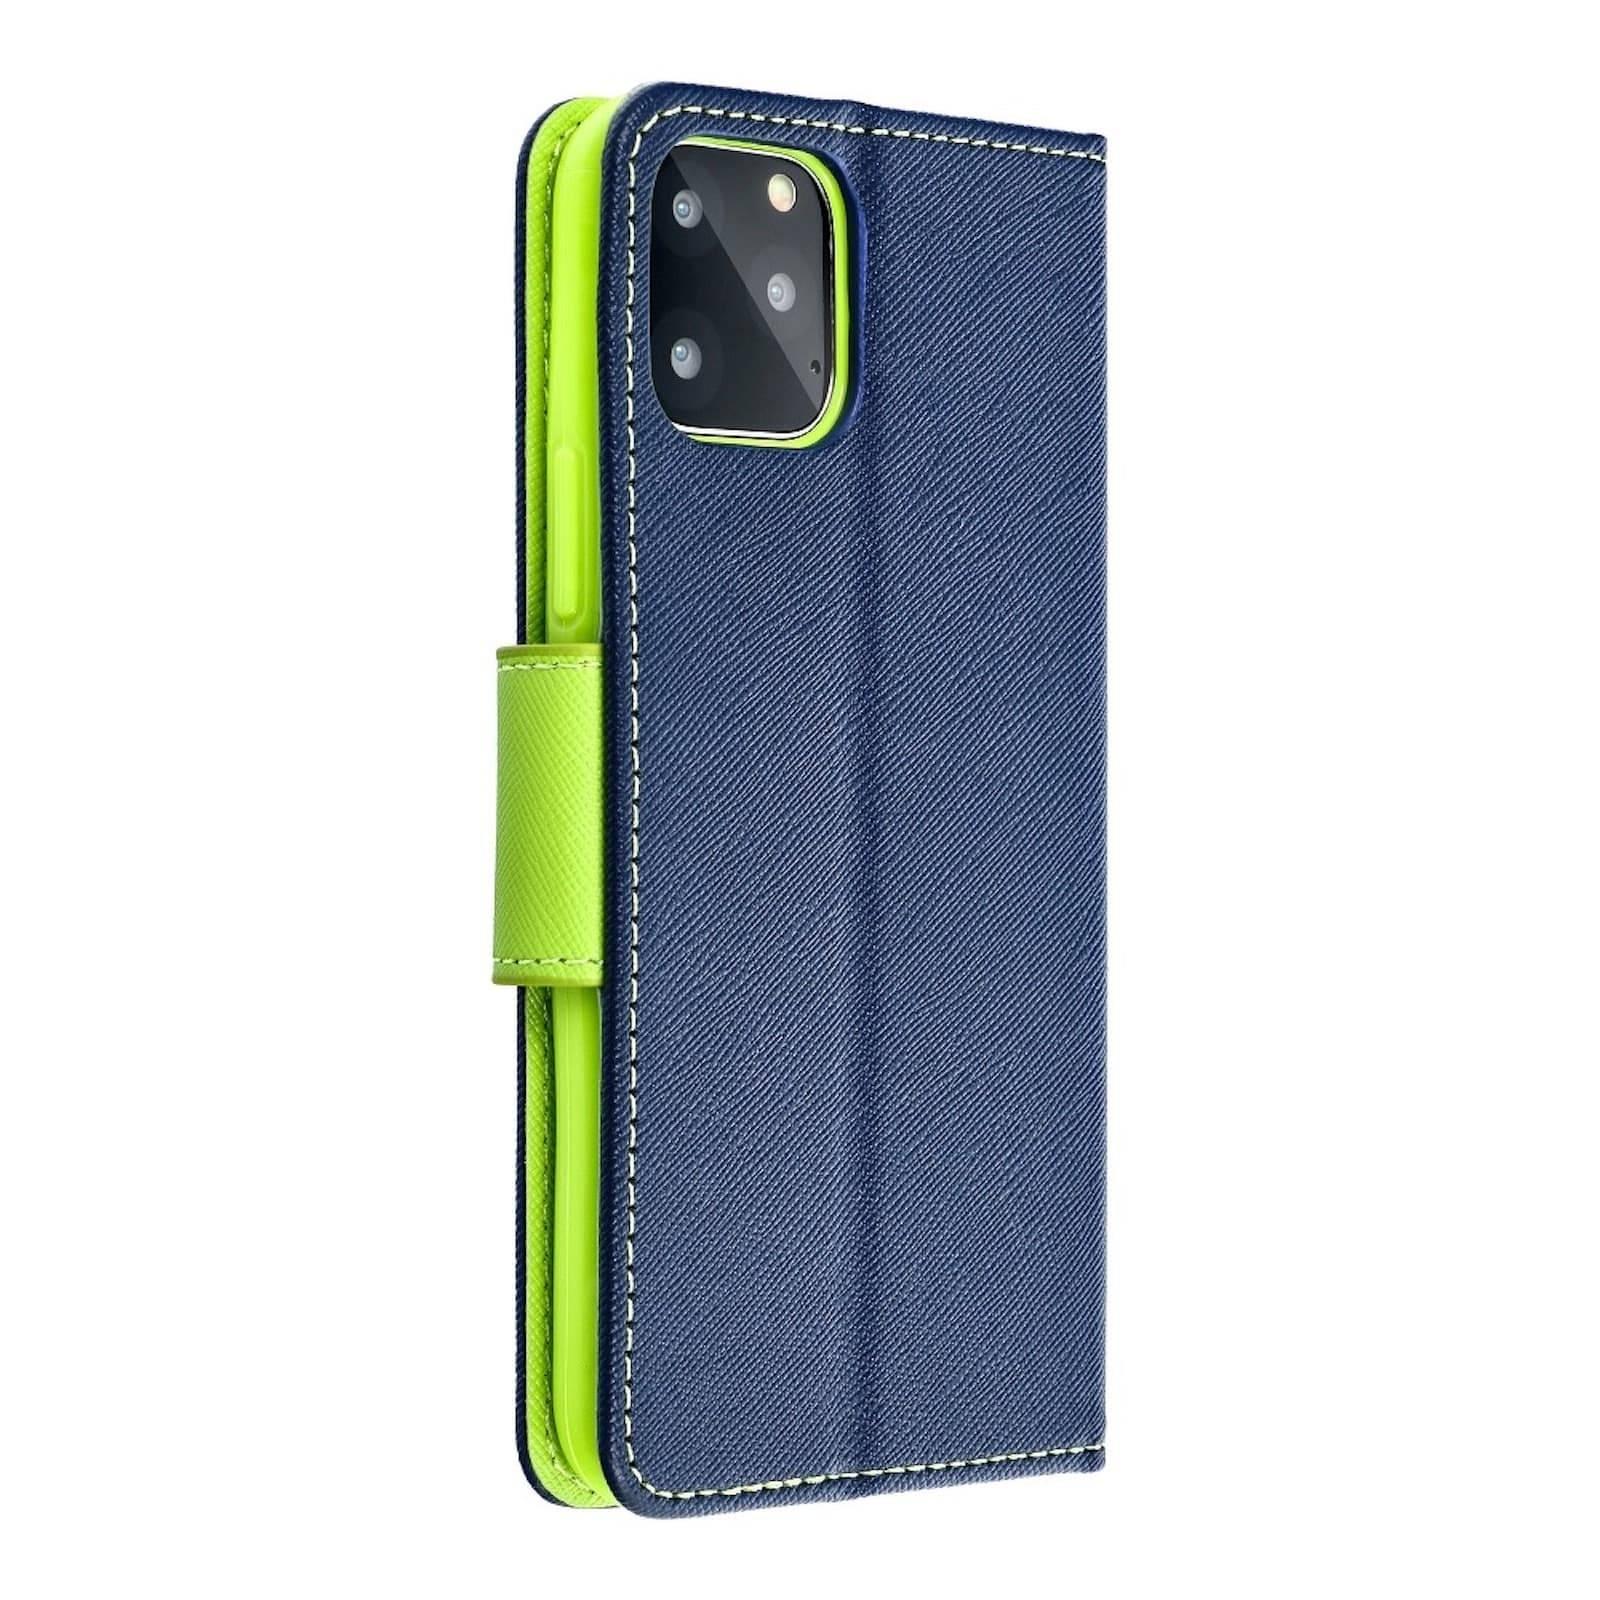 Coque Etui Fancy Book pour Samsung Note 10 Lite navy/lime